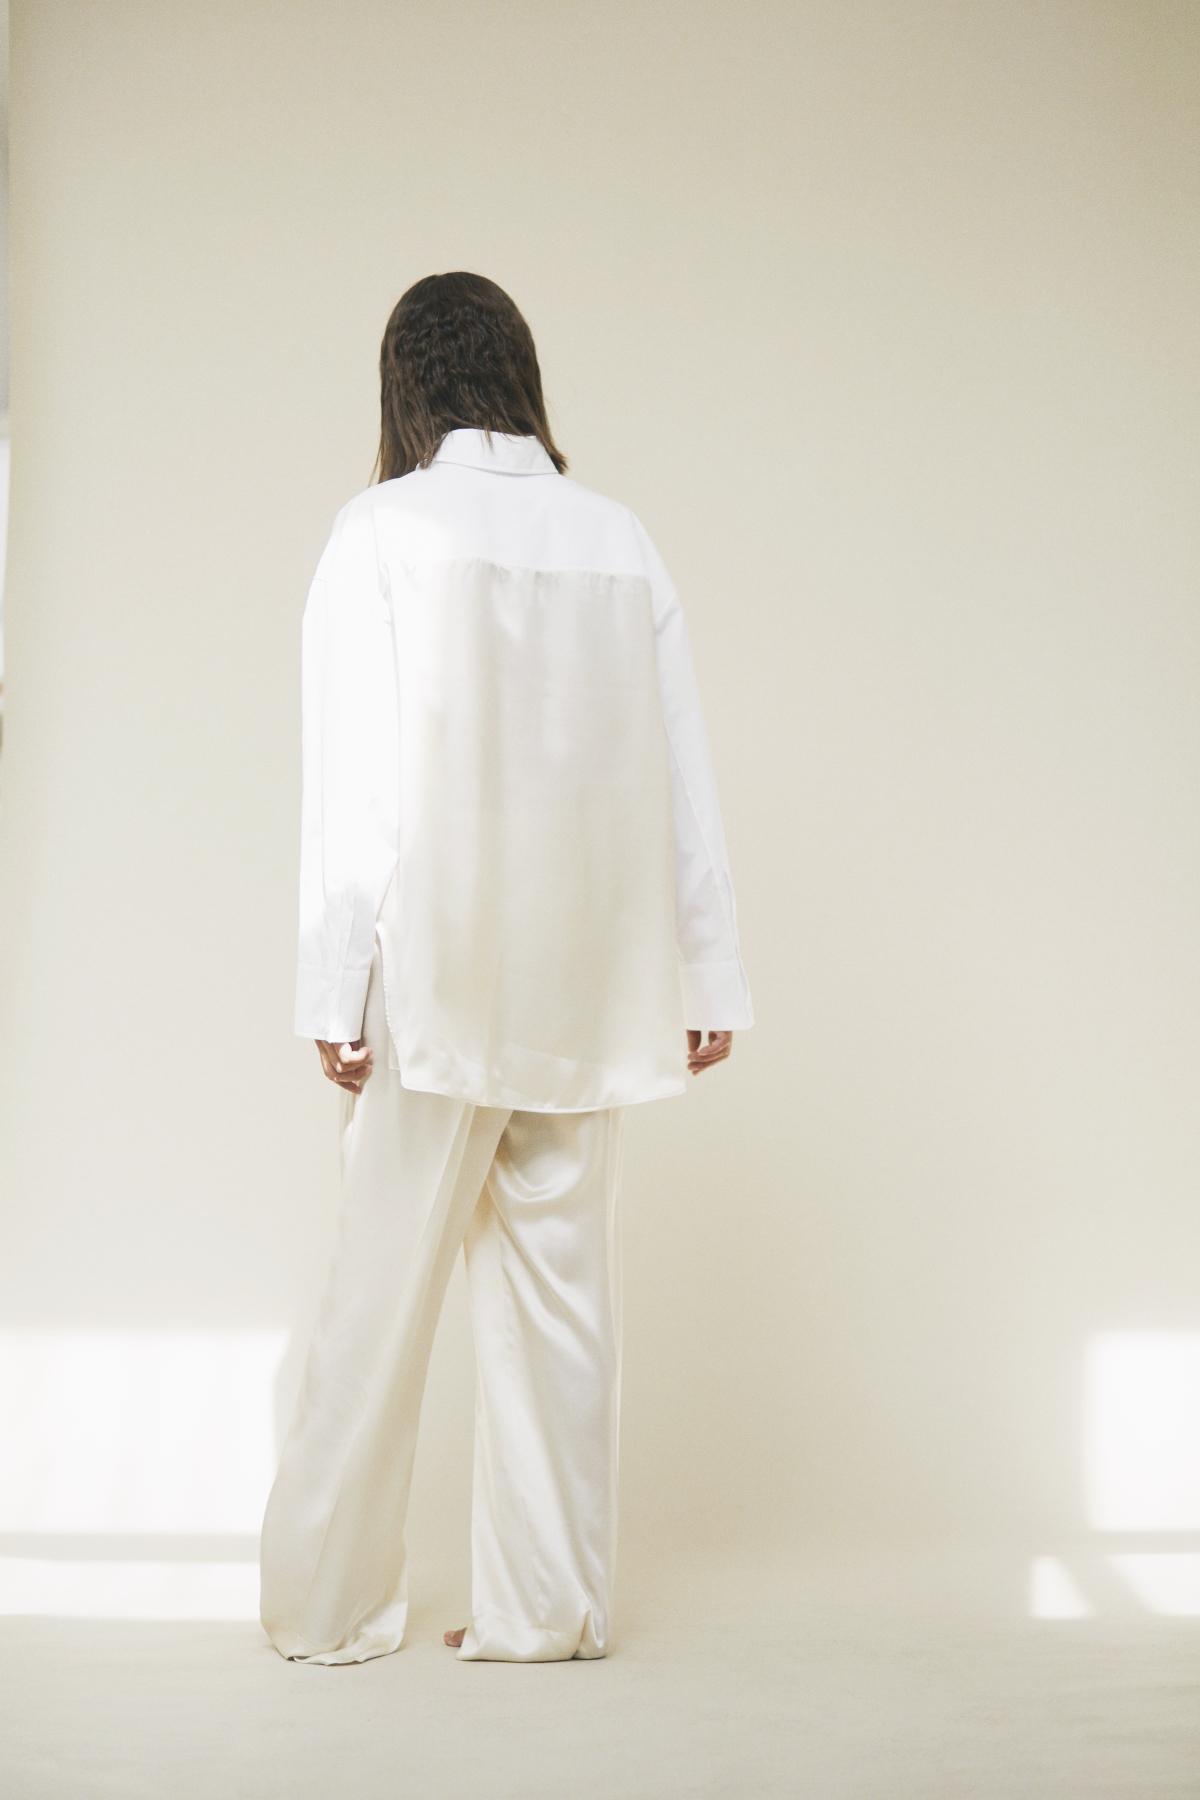 Shirt SEFIE, Trousers SOPHIA